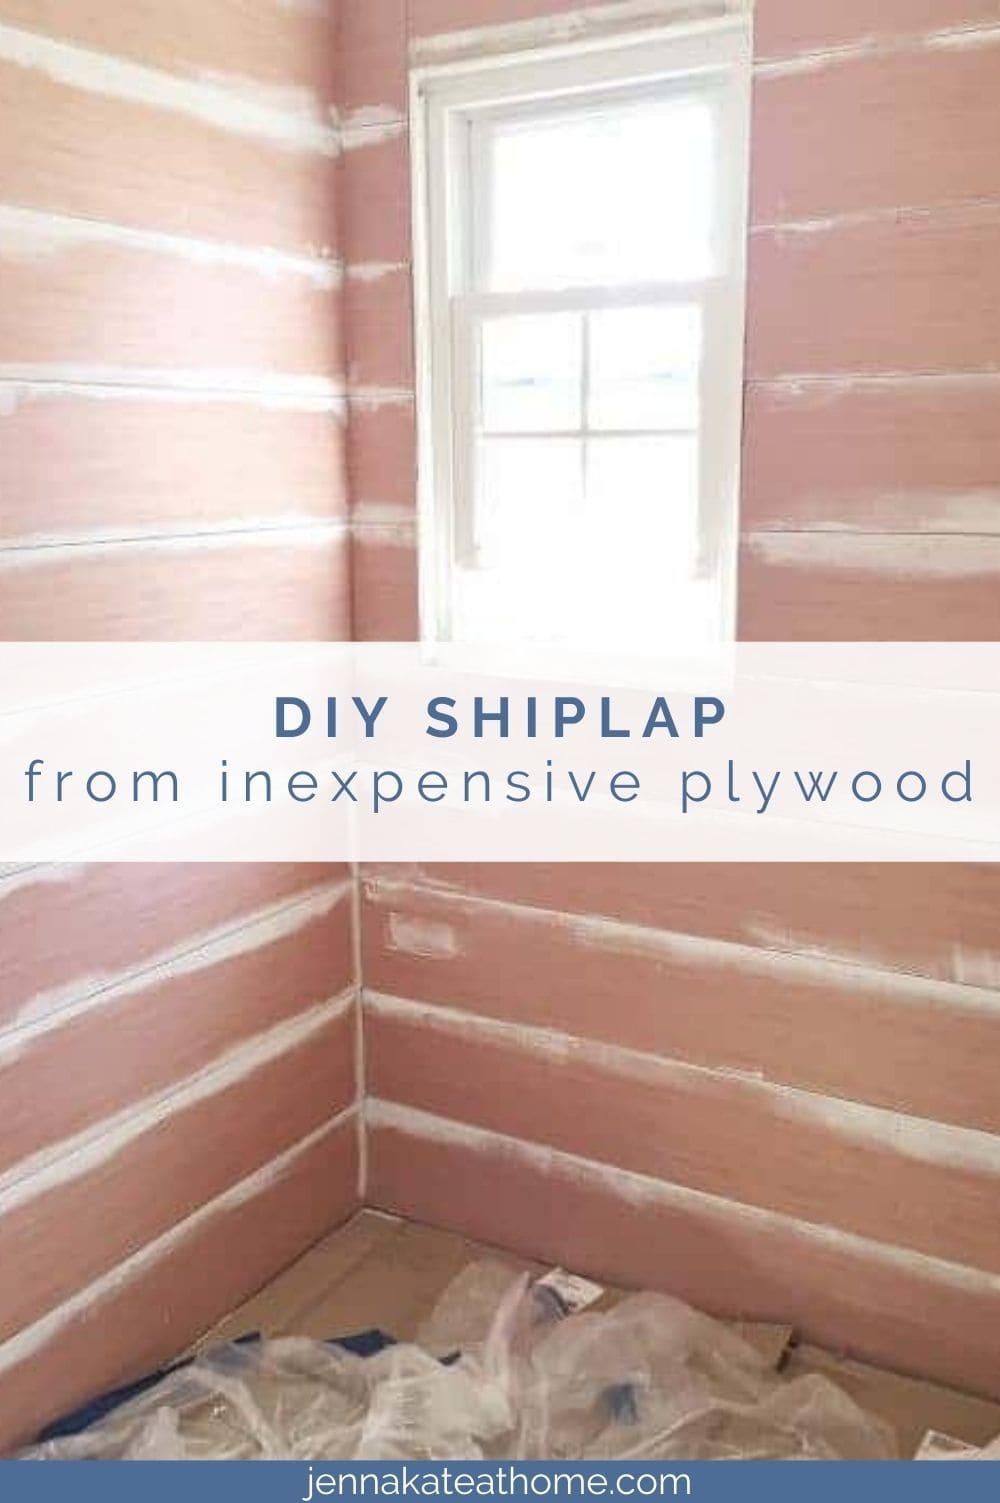 diy shiplap walls from plywood